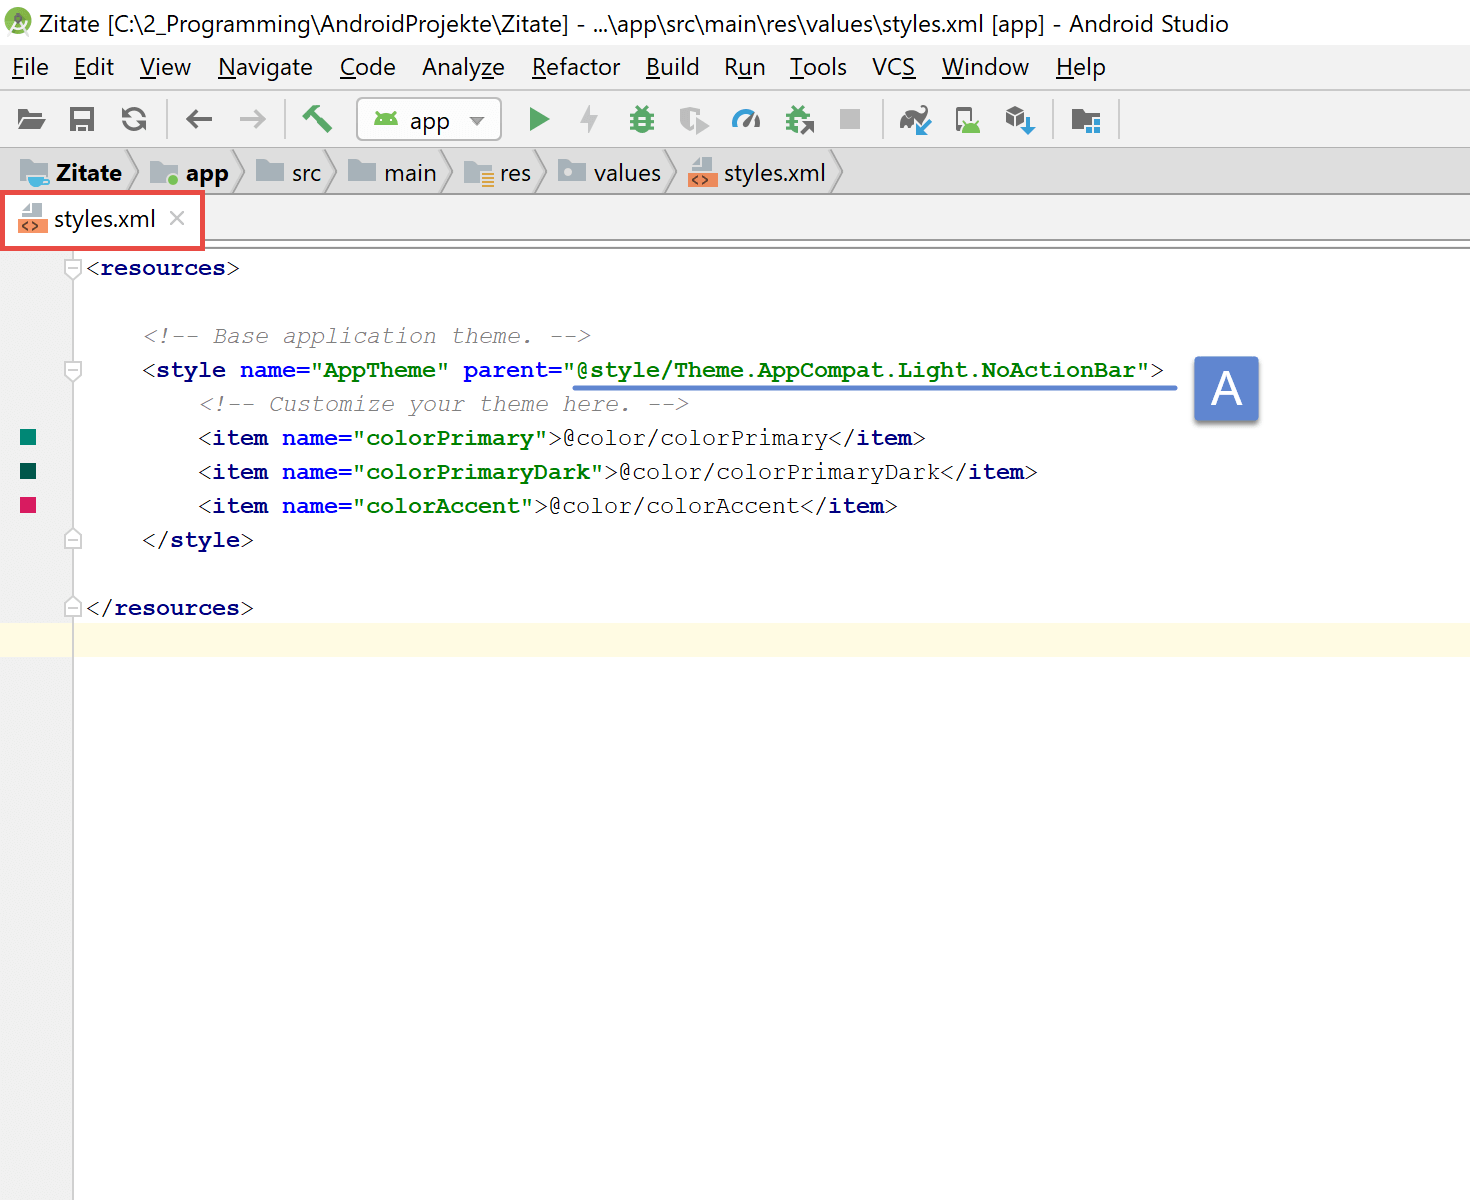 noactionbar_styles_code